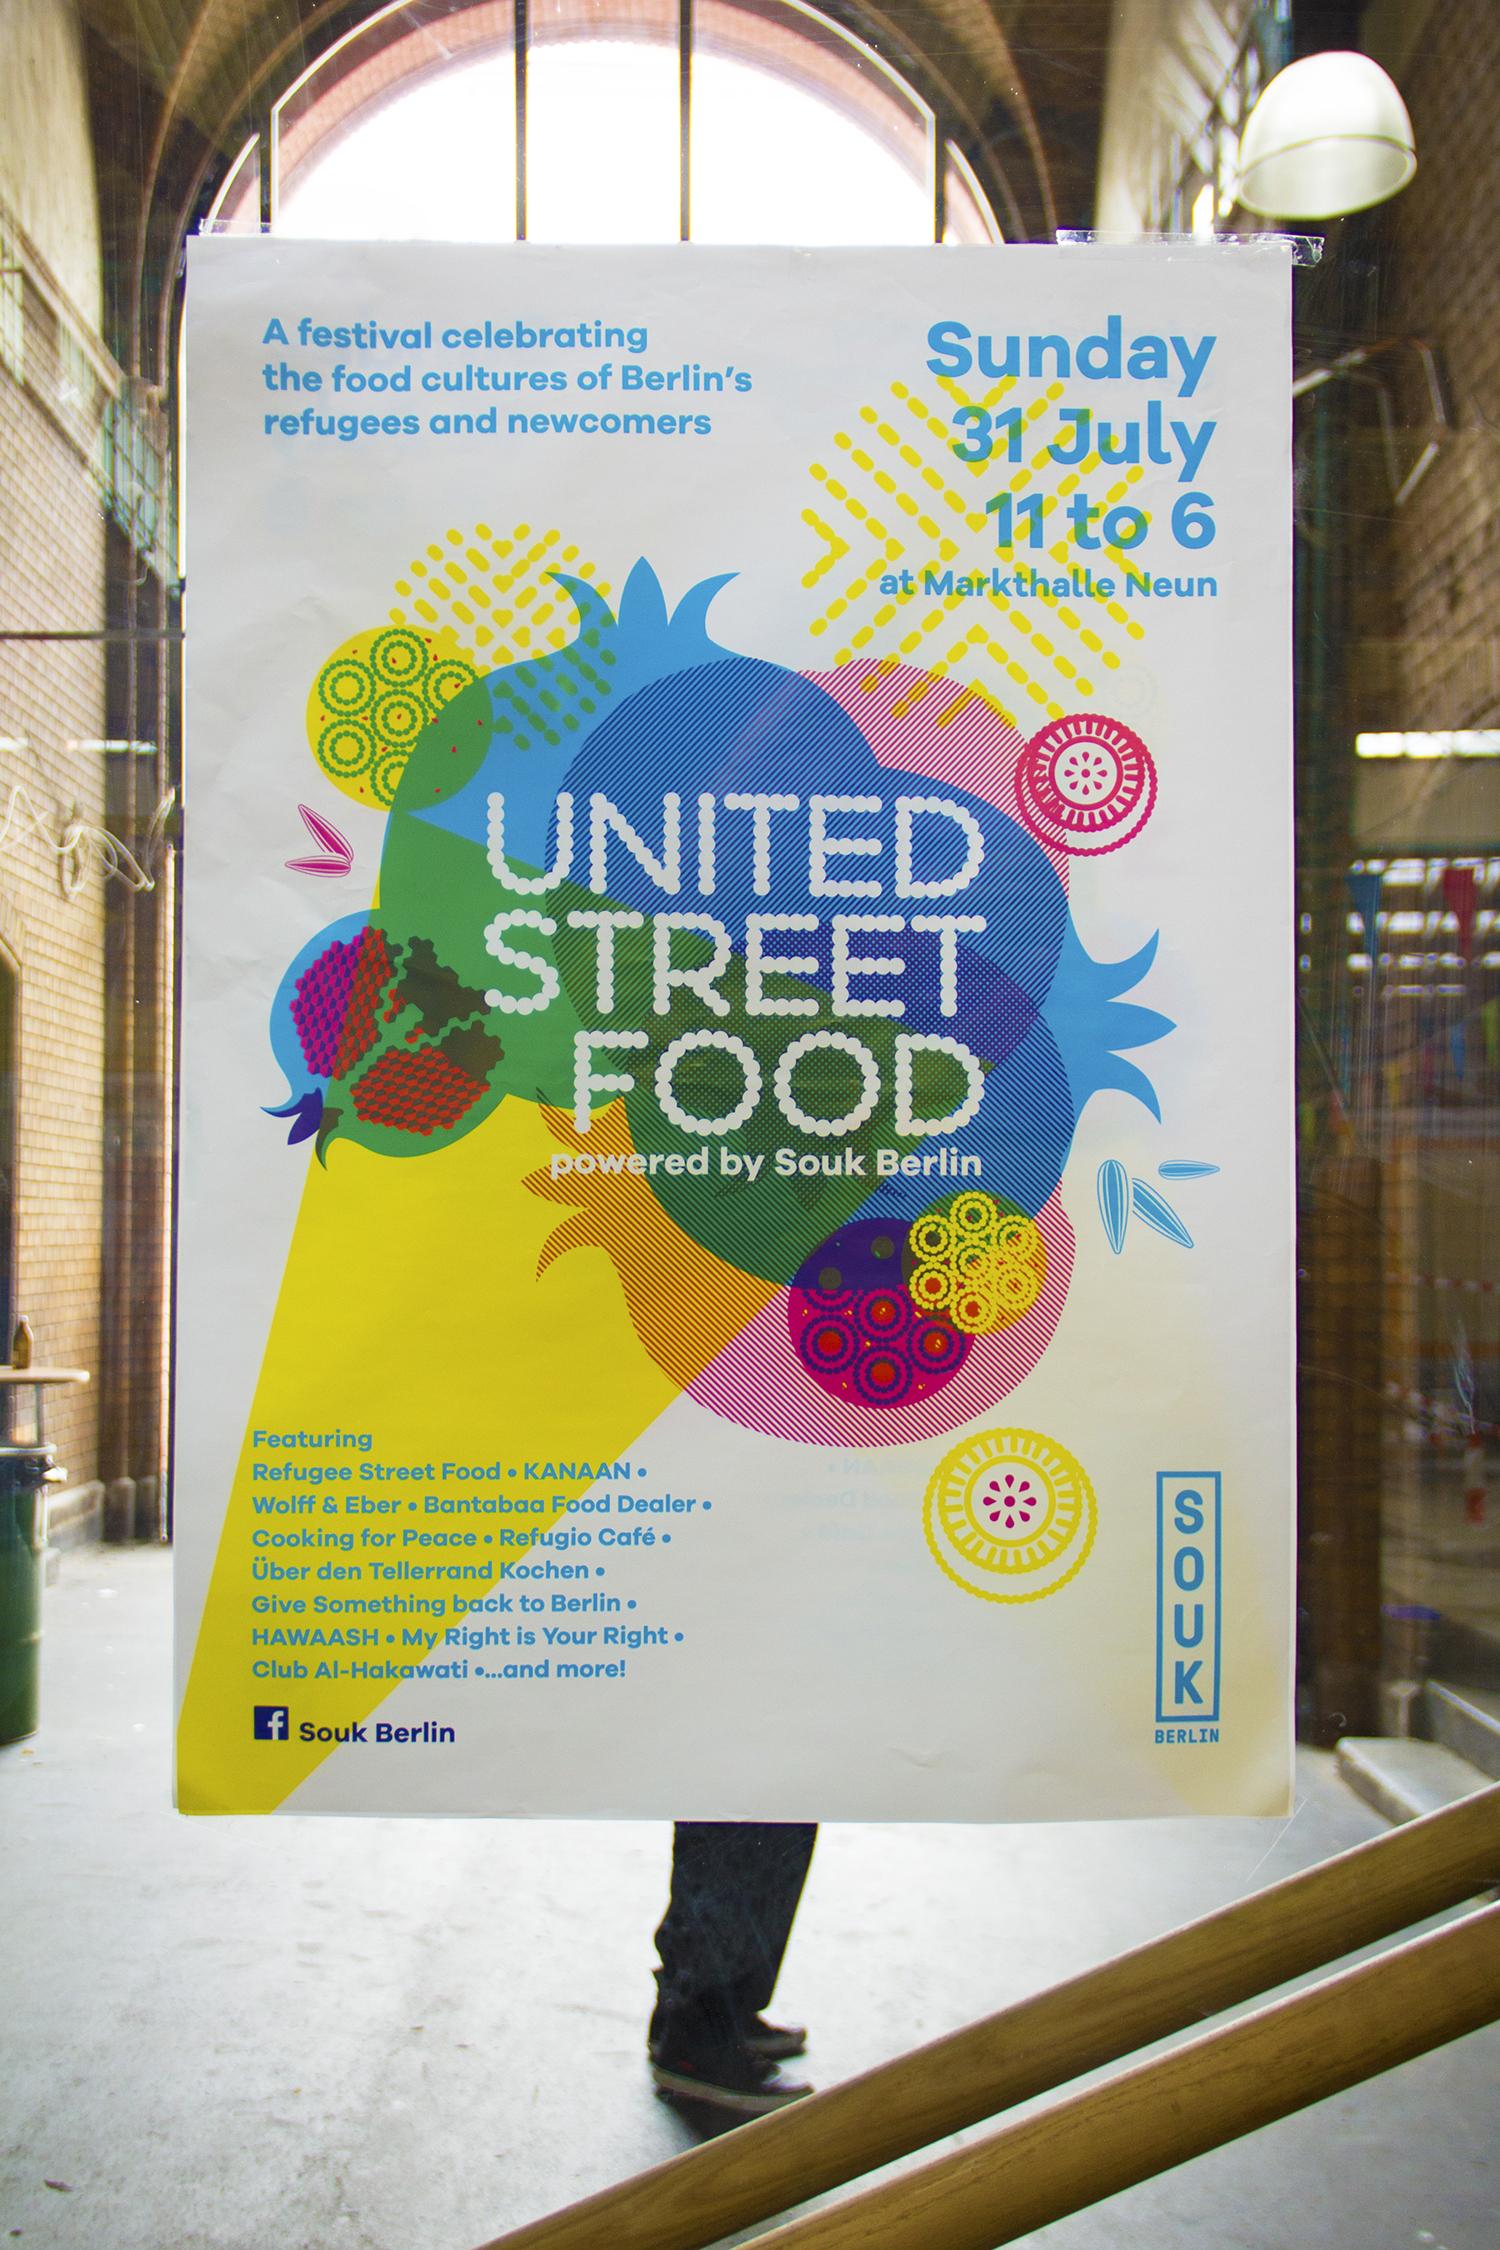 United Street Food Poster